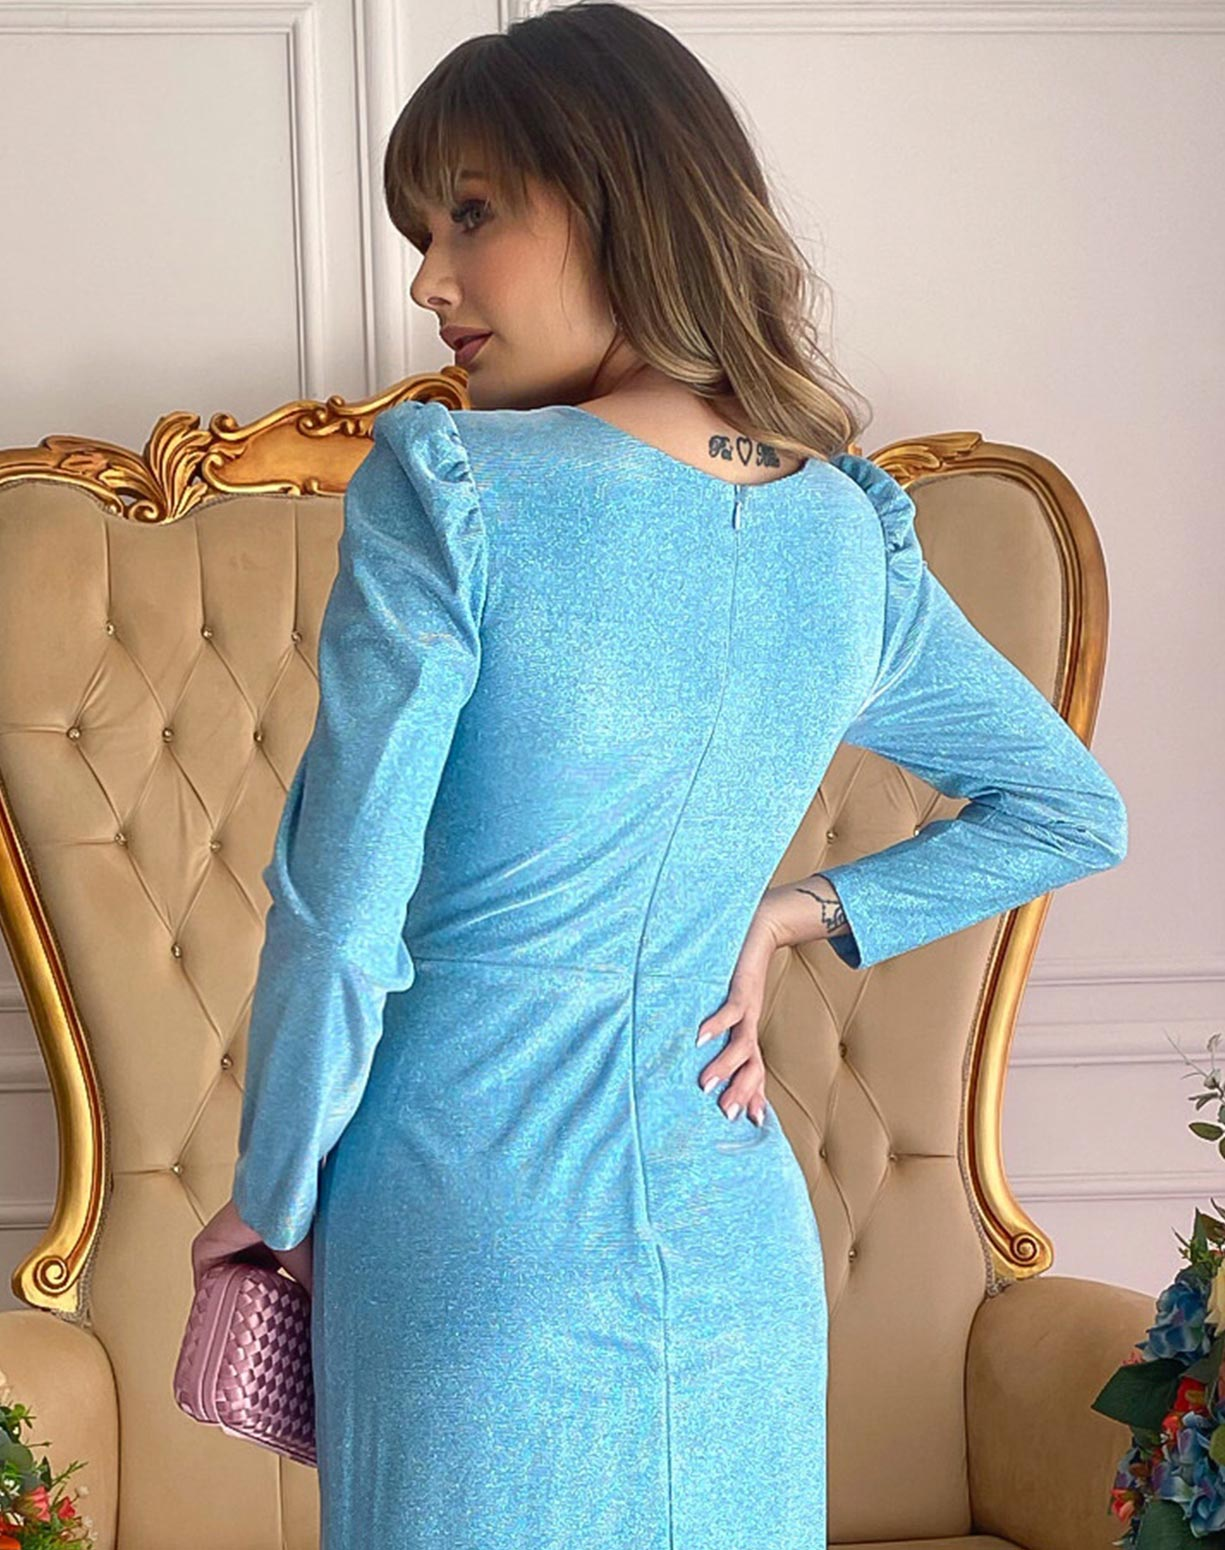 Vestido Manga Longa Azul Serenity em Lurex com Glitter